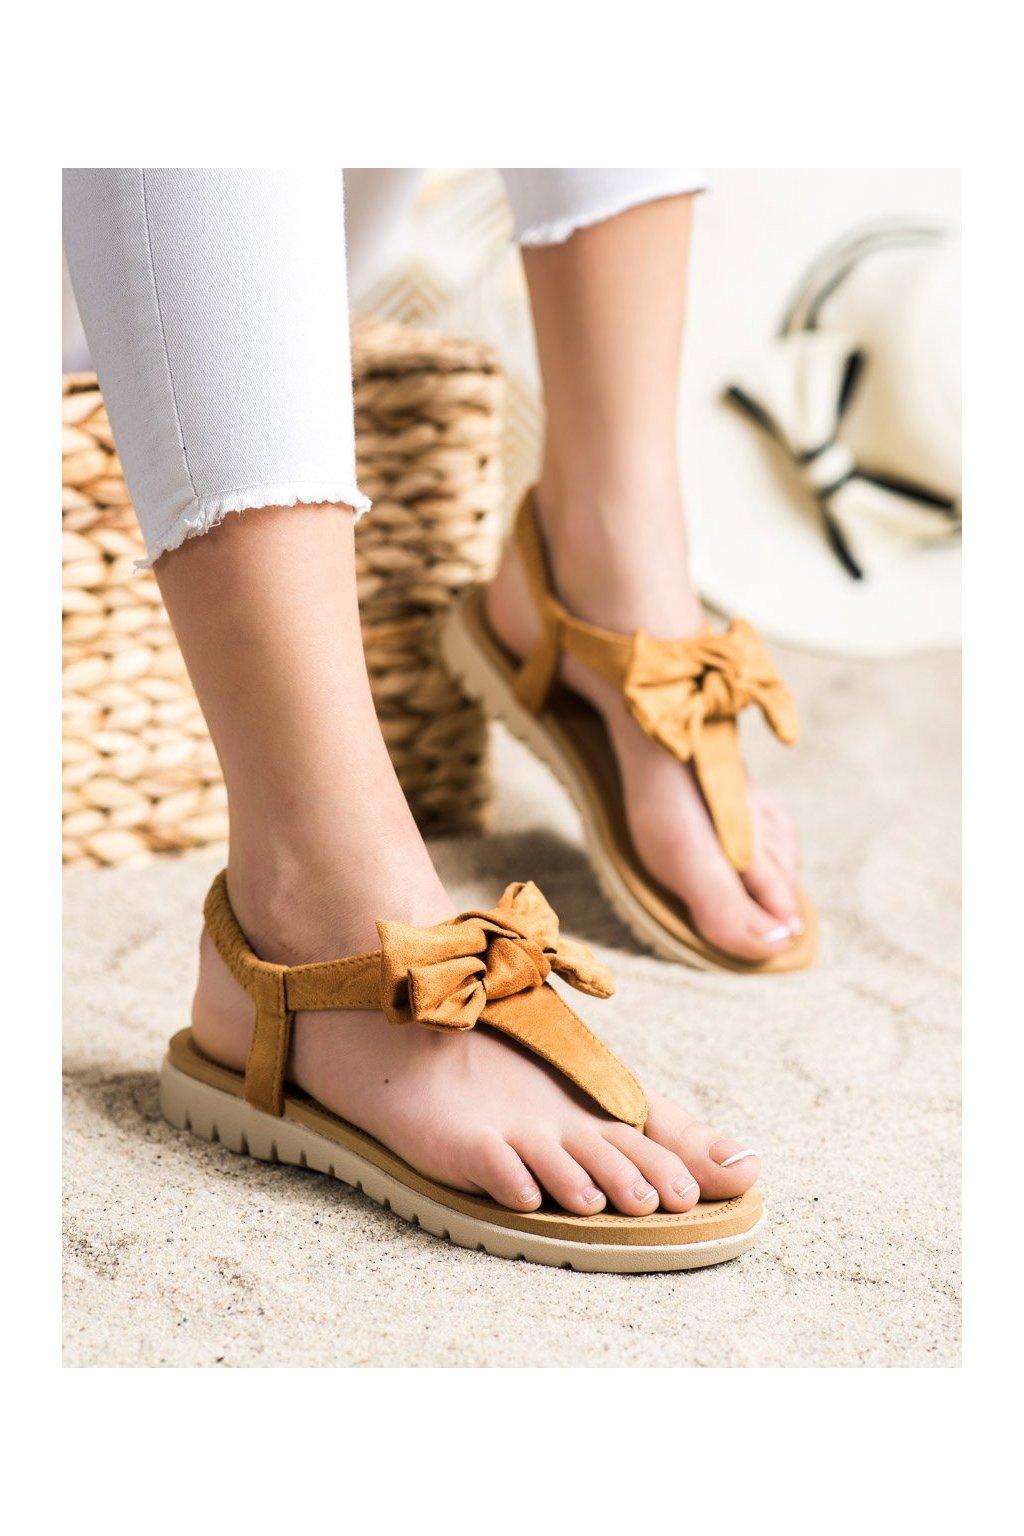 Hnedé sandále Shelovet kod 697C